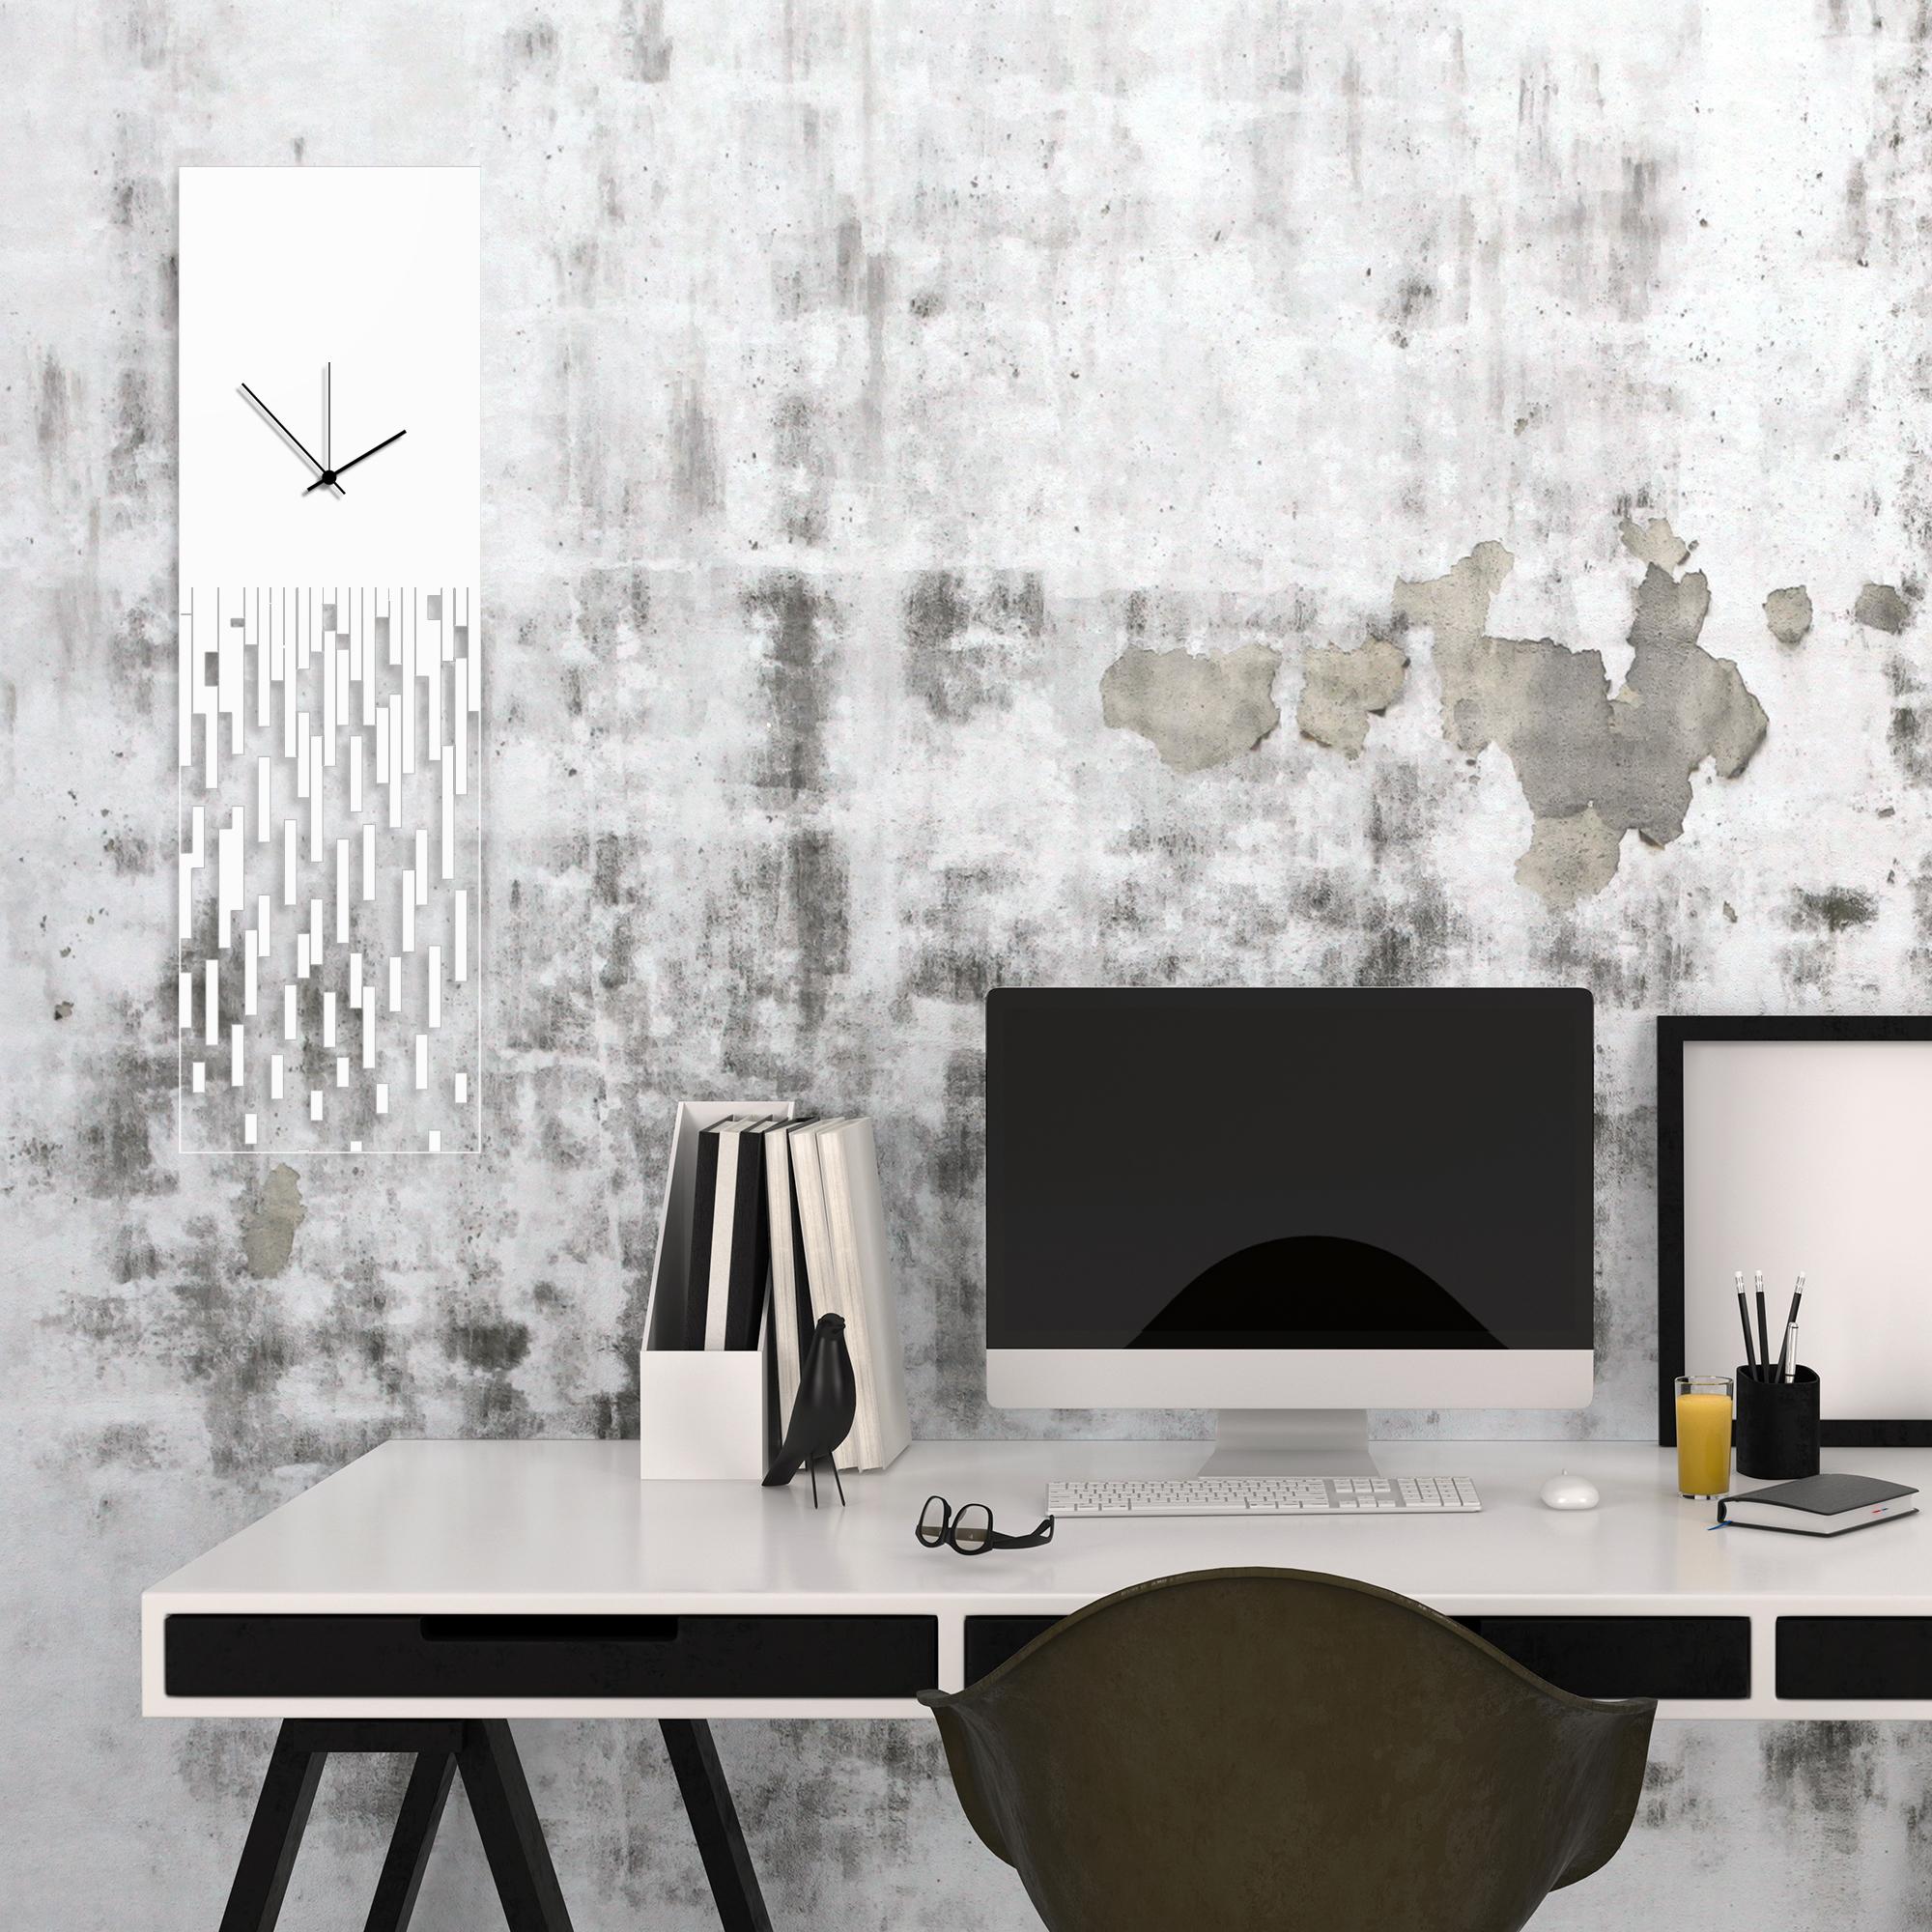 White Pixelated Clock by Adam Schwoeppe Surreal Wall Clock on Acrylic - Alternate View 1